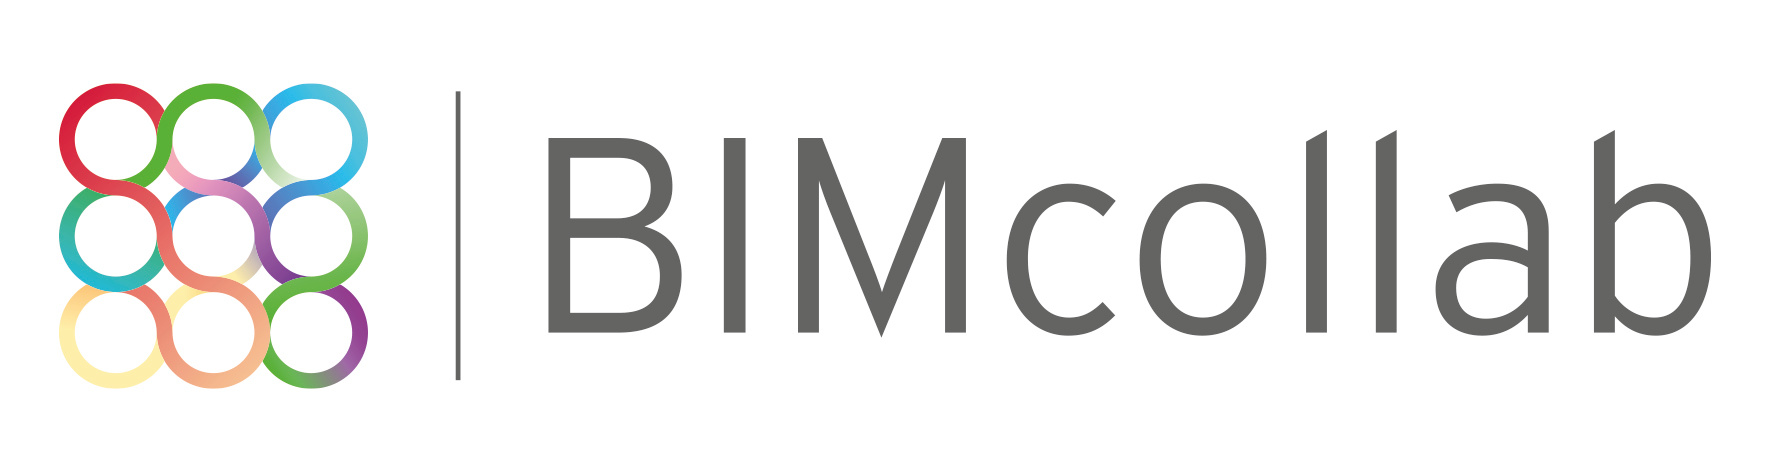 bimcollab_logo_cmyk